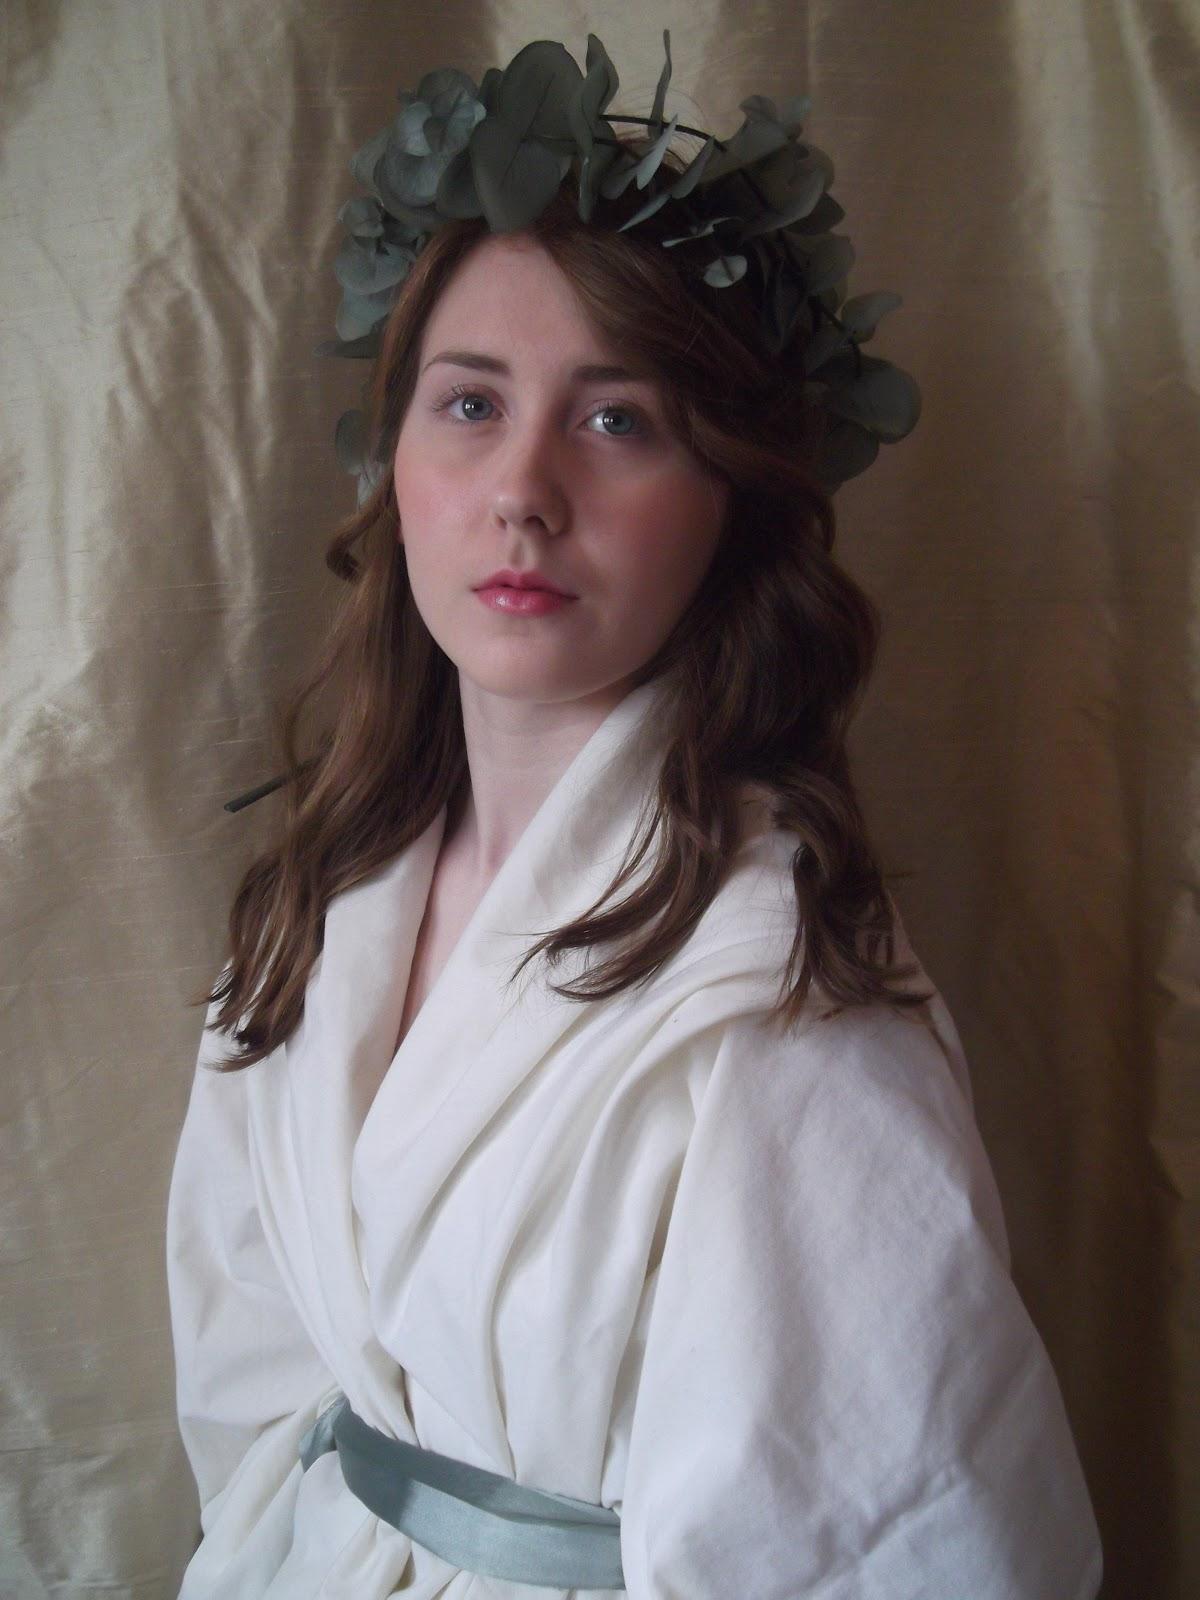 Helen: Emma, Lady Hamilton